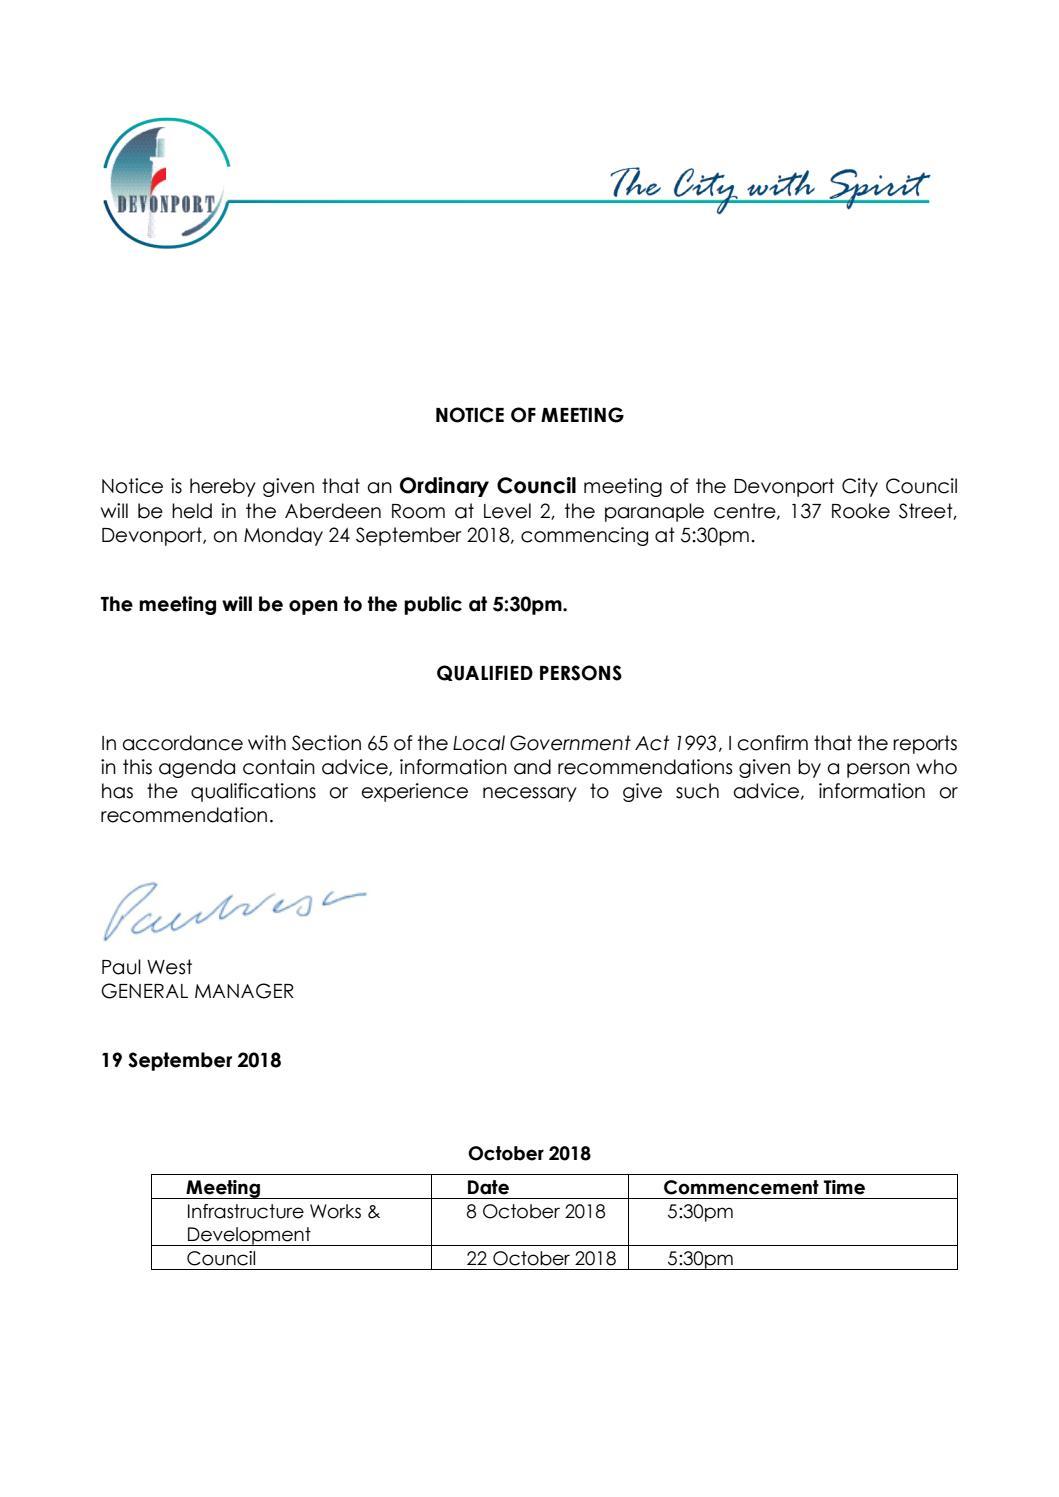 Agenda - Council Meeting - 24 September 2018 by Devonport City